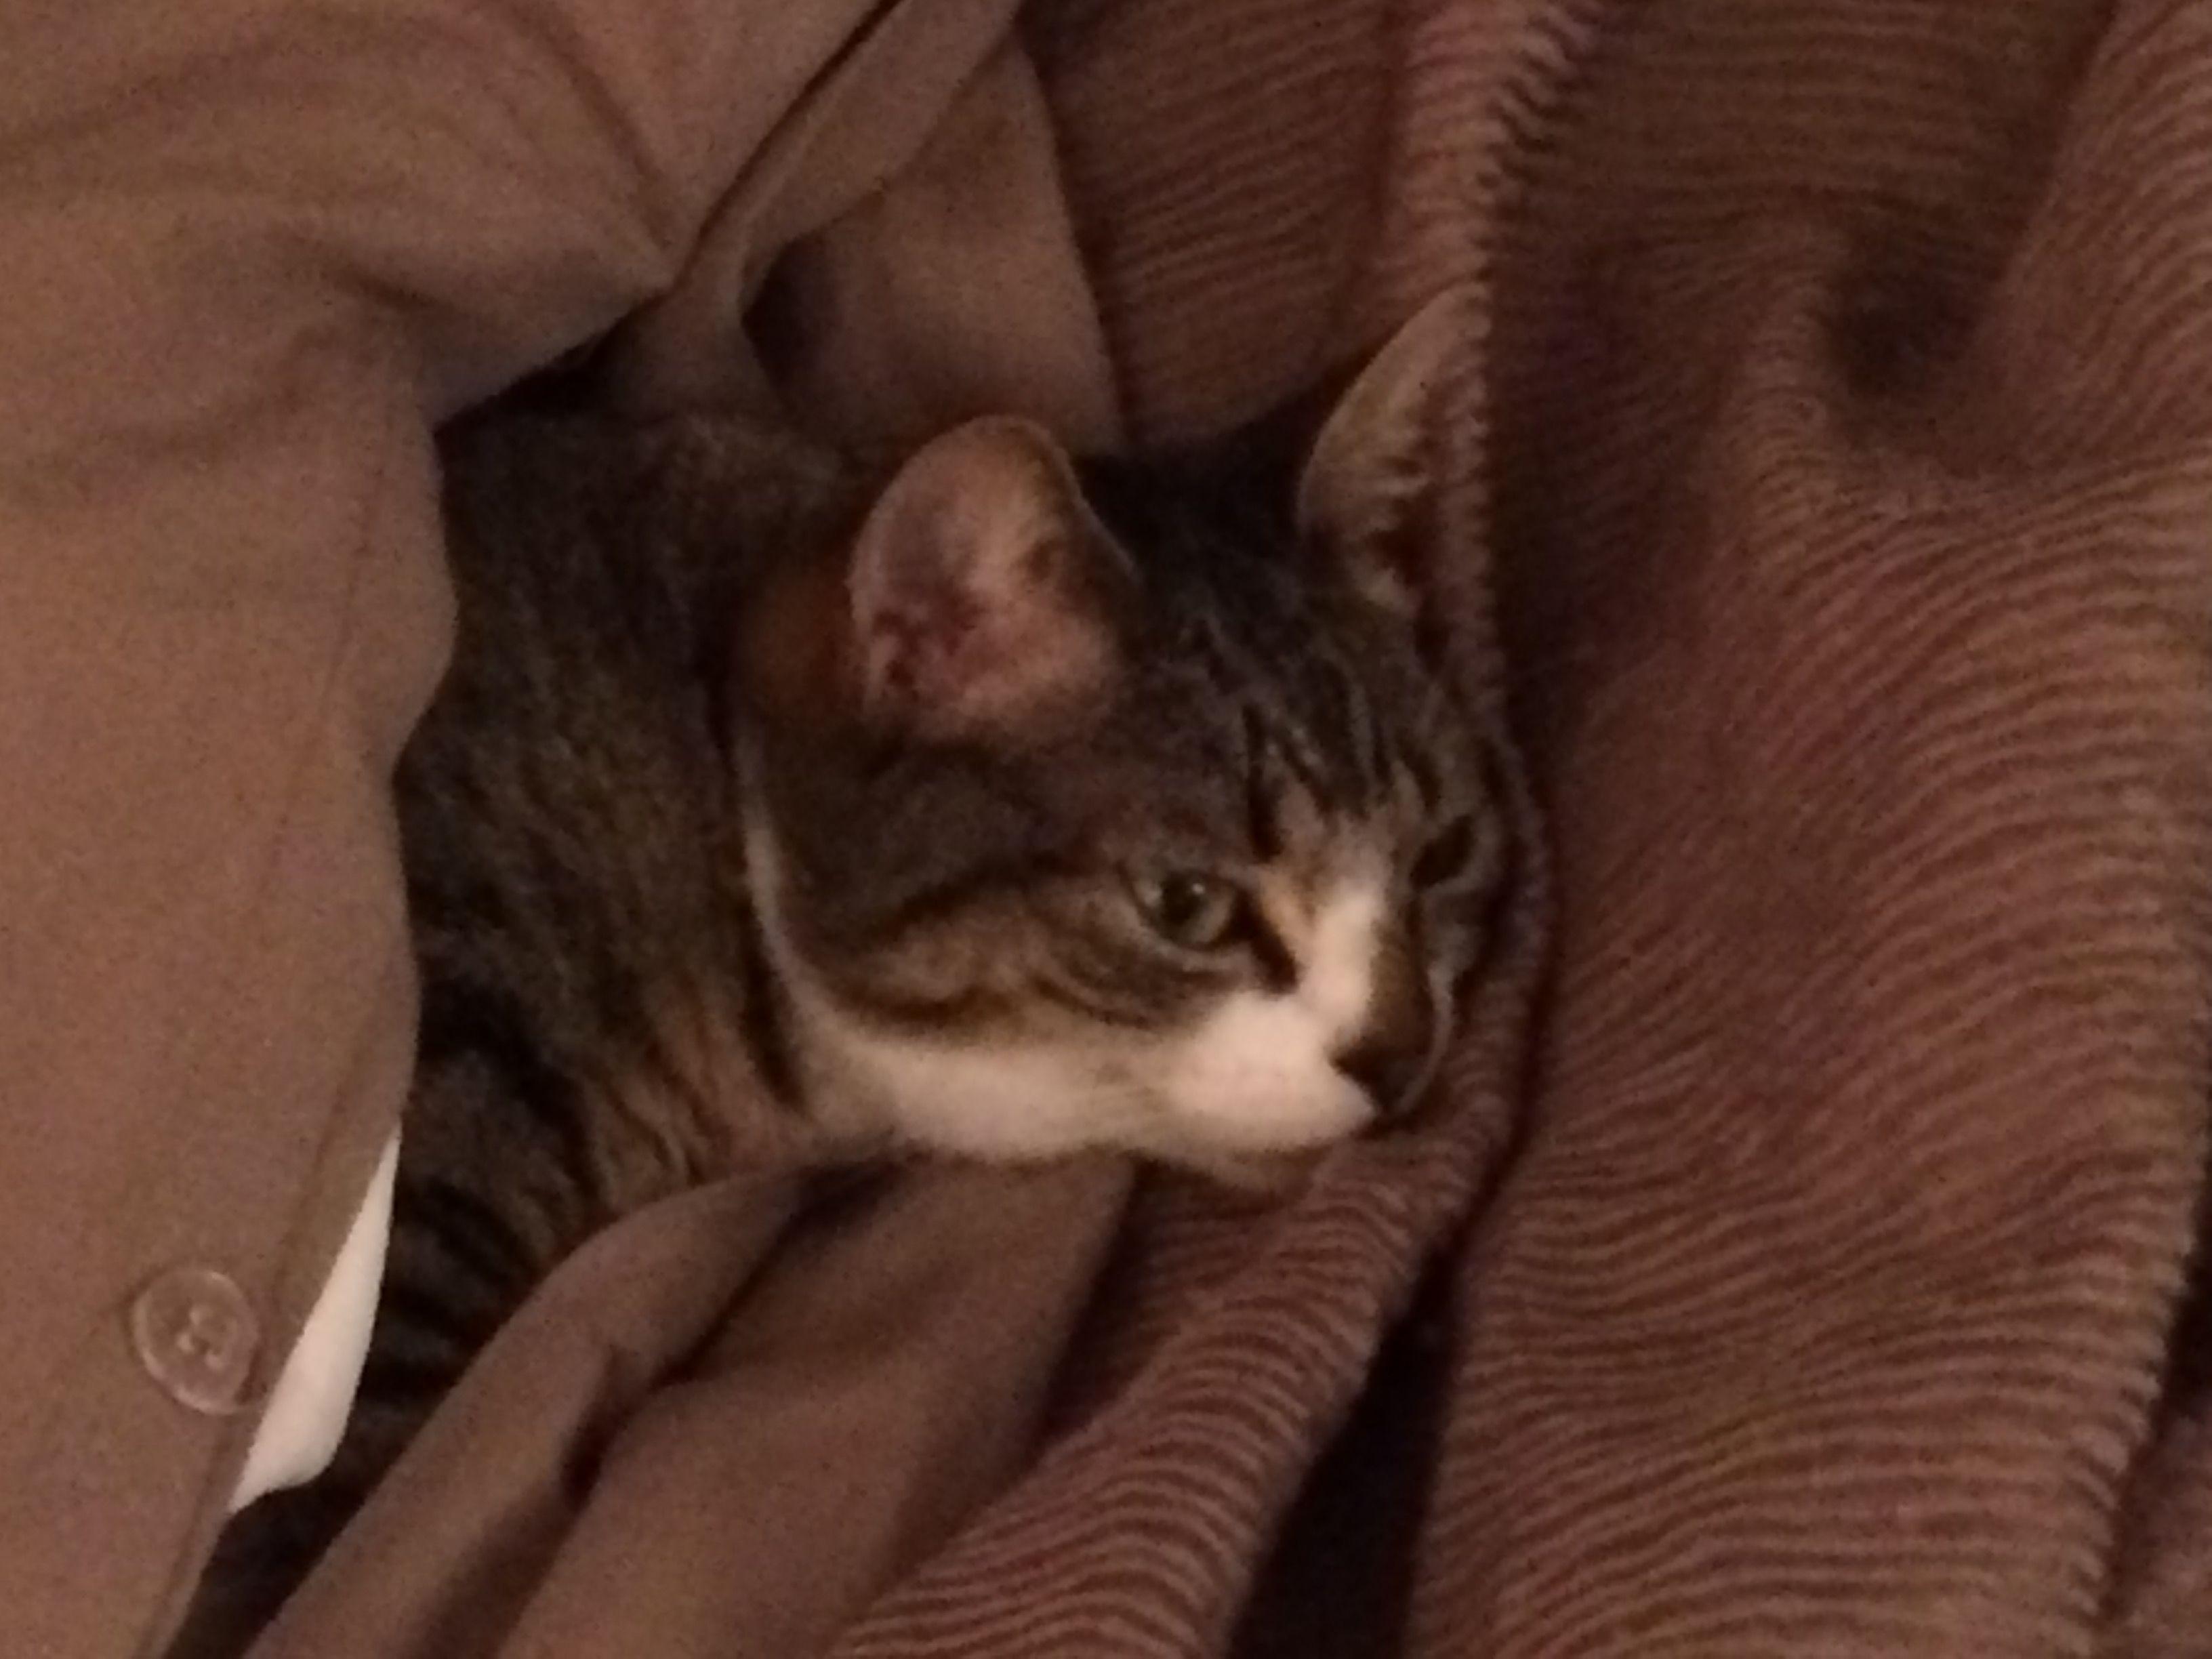 Maxcy found her way inside my duvet...